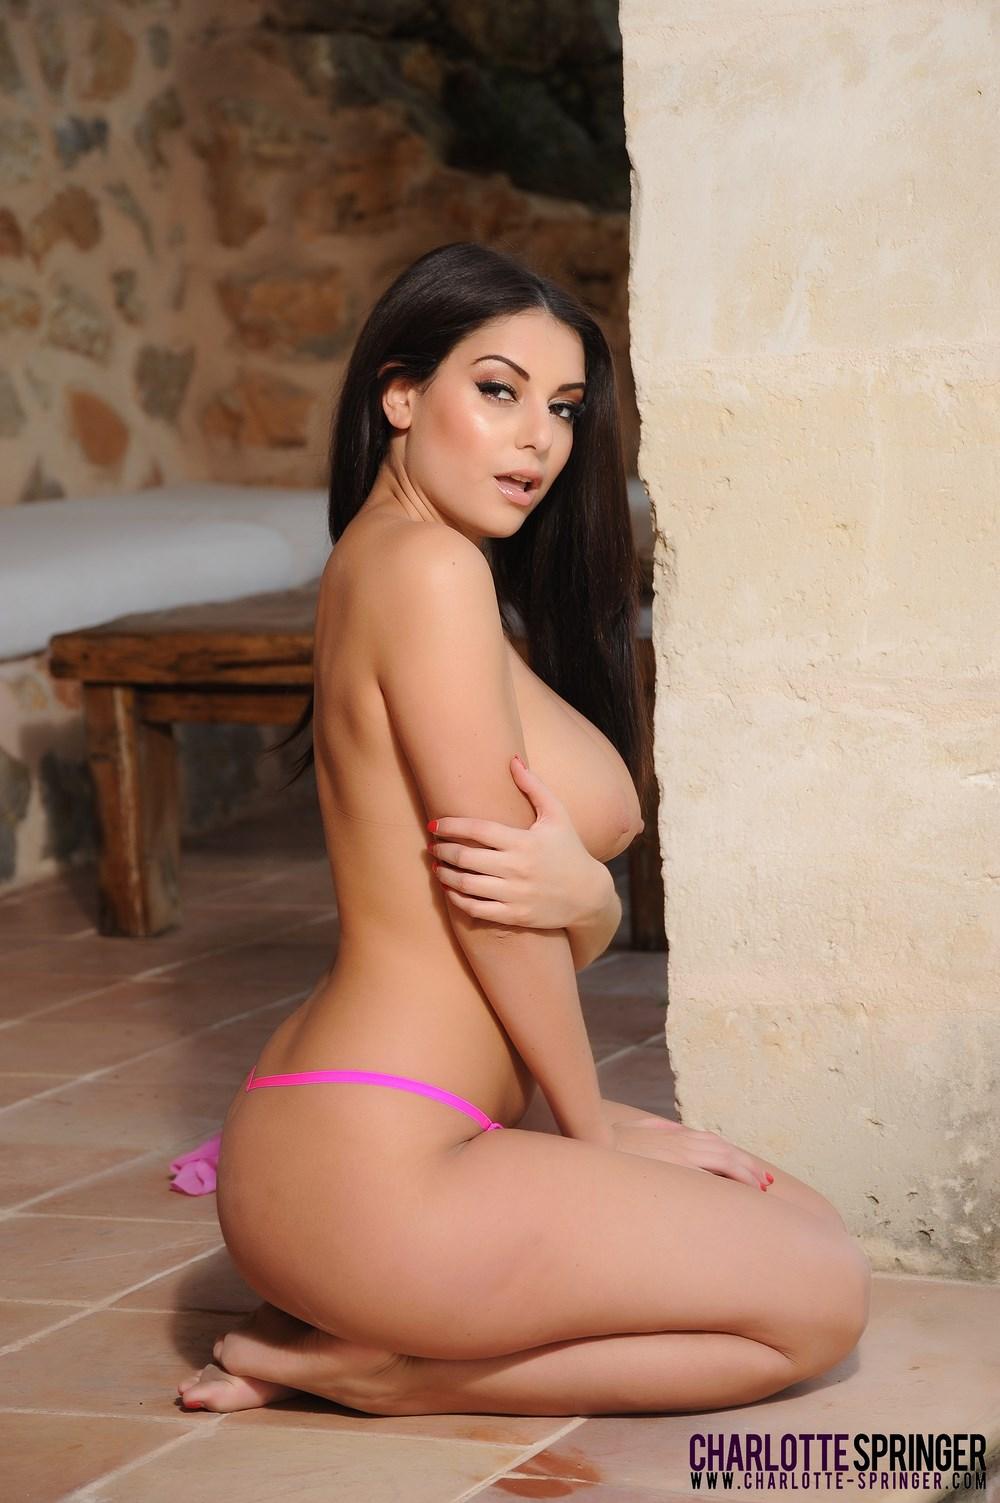 Alena Chrastinova Porn Tube charlotte springer charlotte in her cute pink nighty 376197